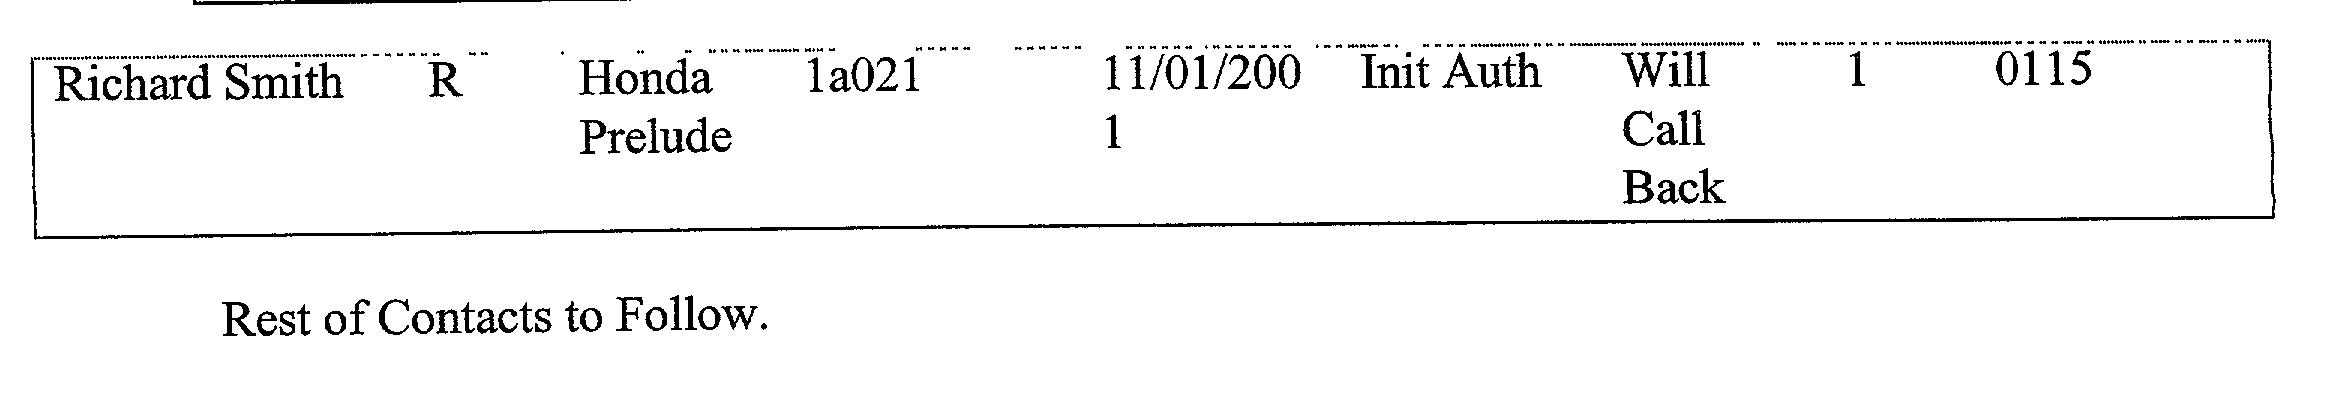 Figure US20030125992A1-20030703-P02108